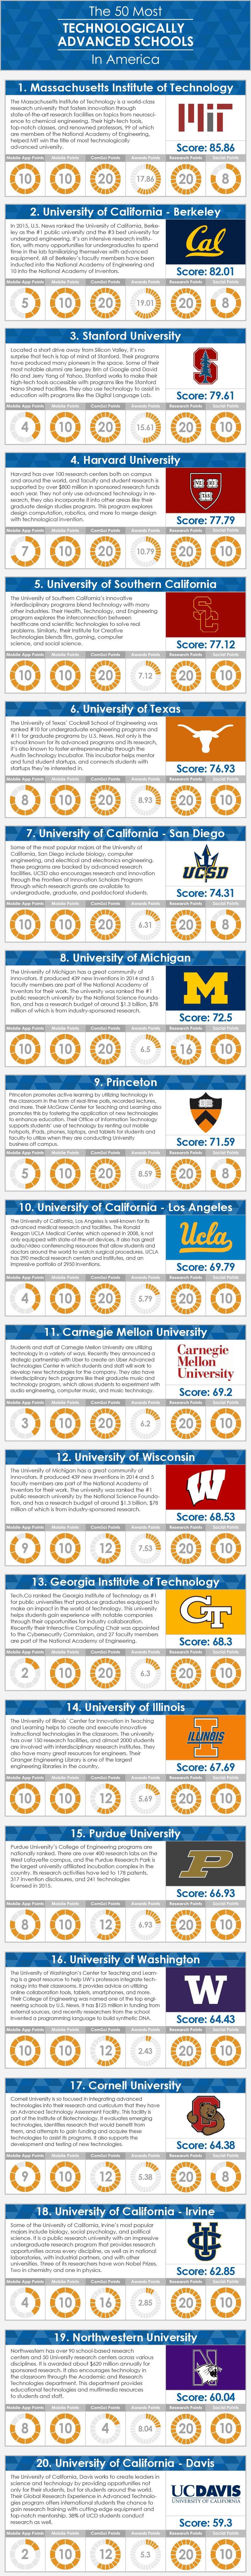 Tech Schools Infographic